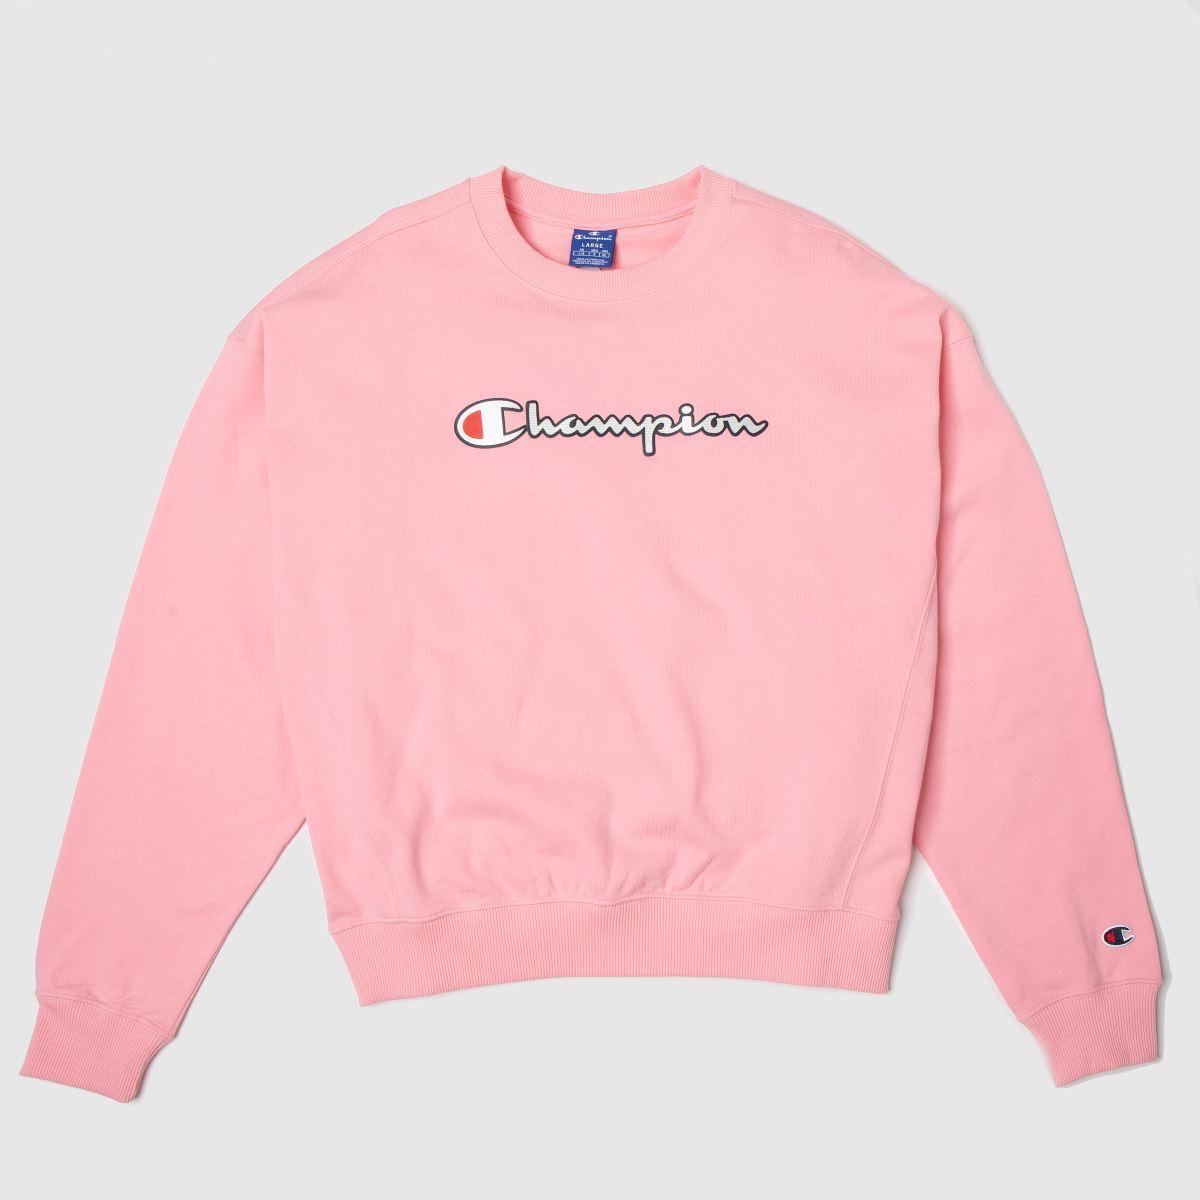 Champion Pink Crewneck Sweatshirt